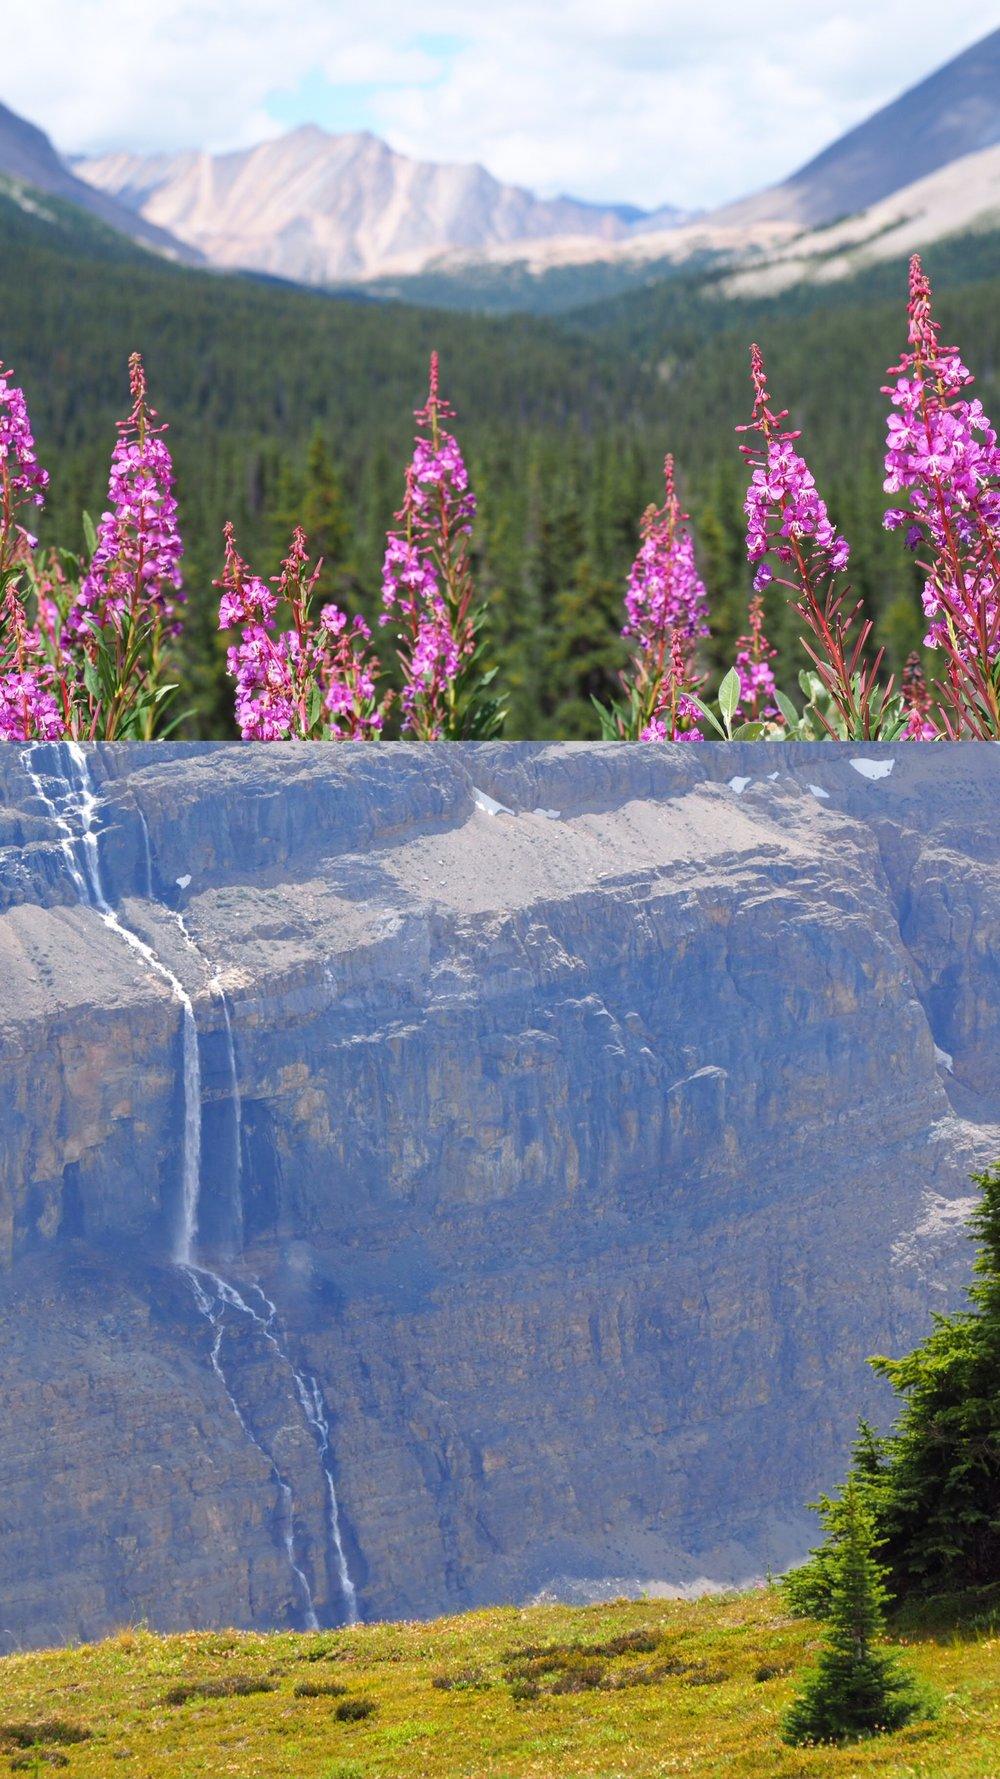 waterfalls coming from Big Bend Peak